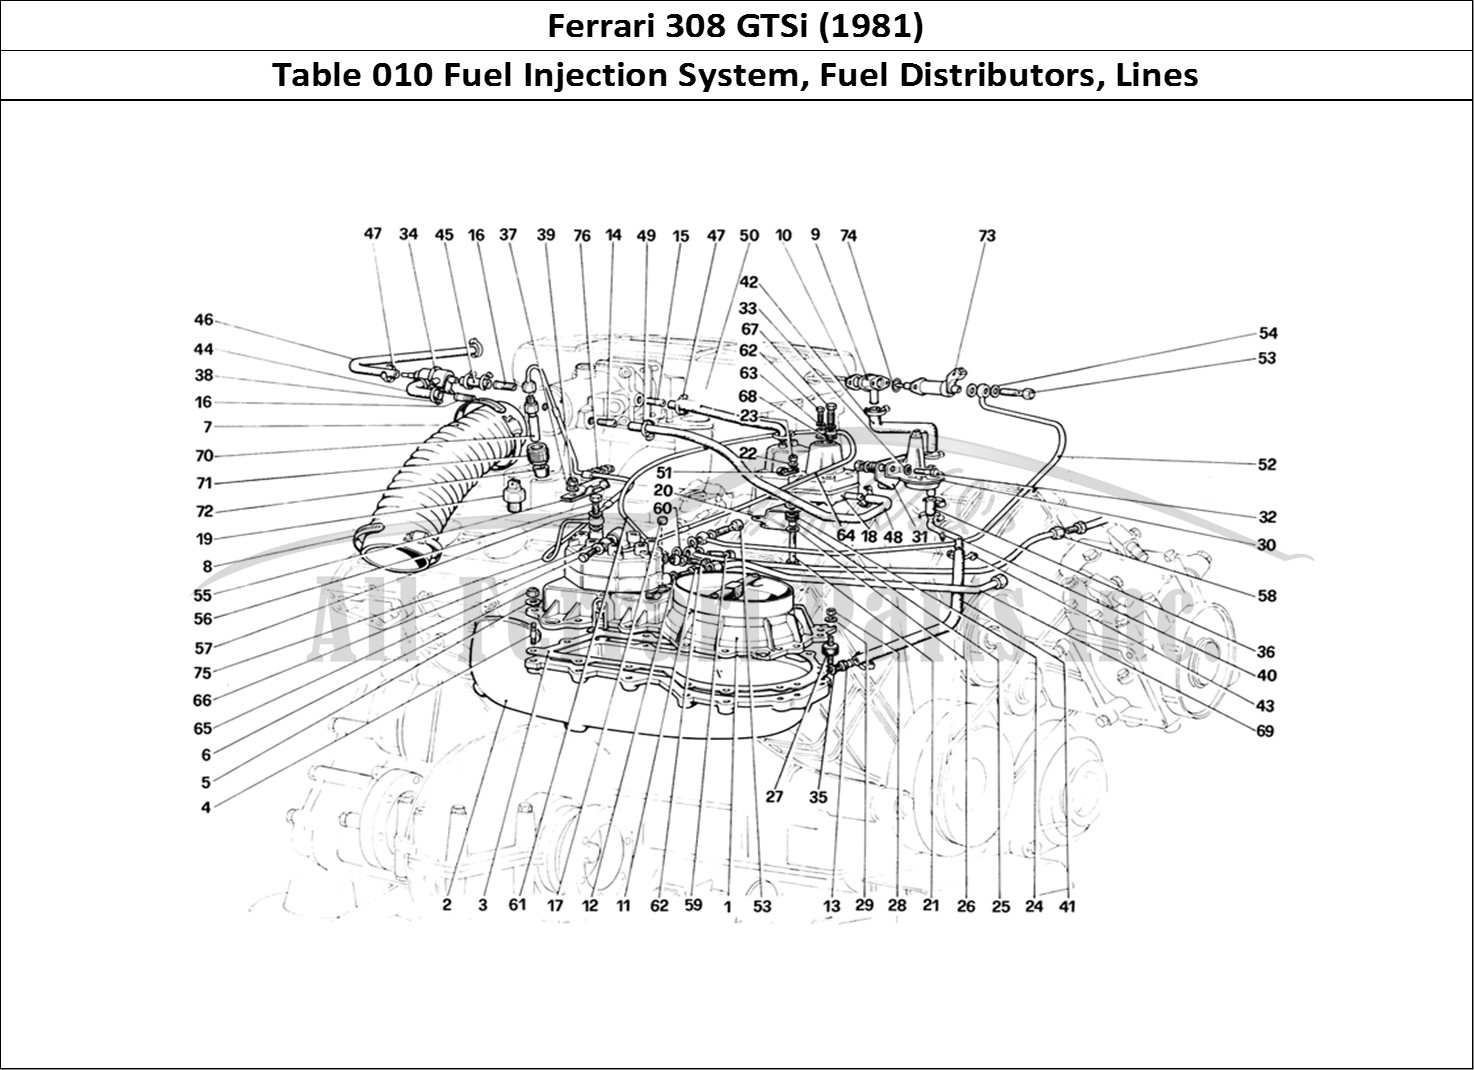 Buy original Ferrari 308 GTSi (1981) 010 Fuel Injection